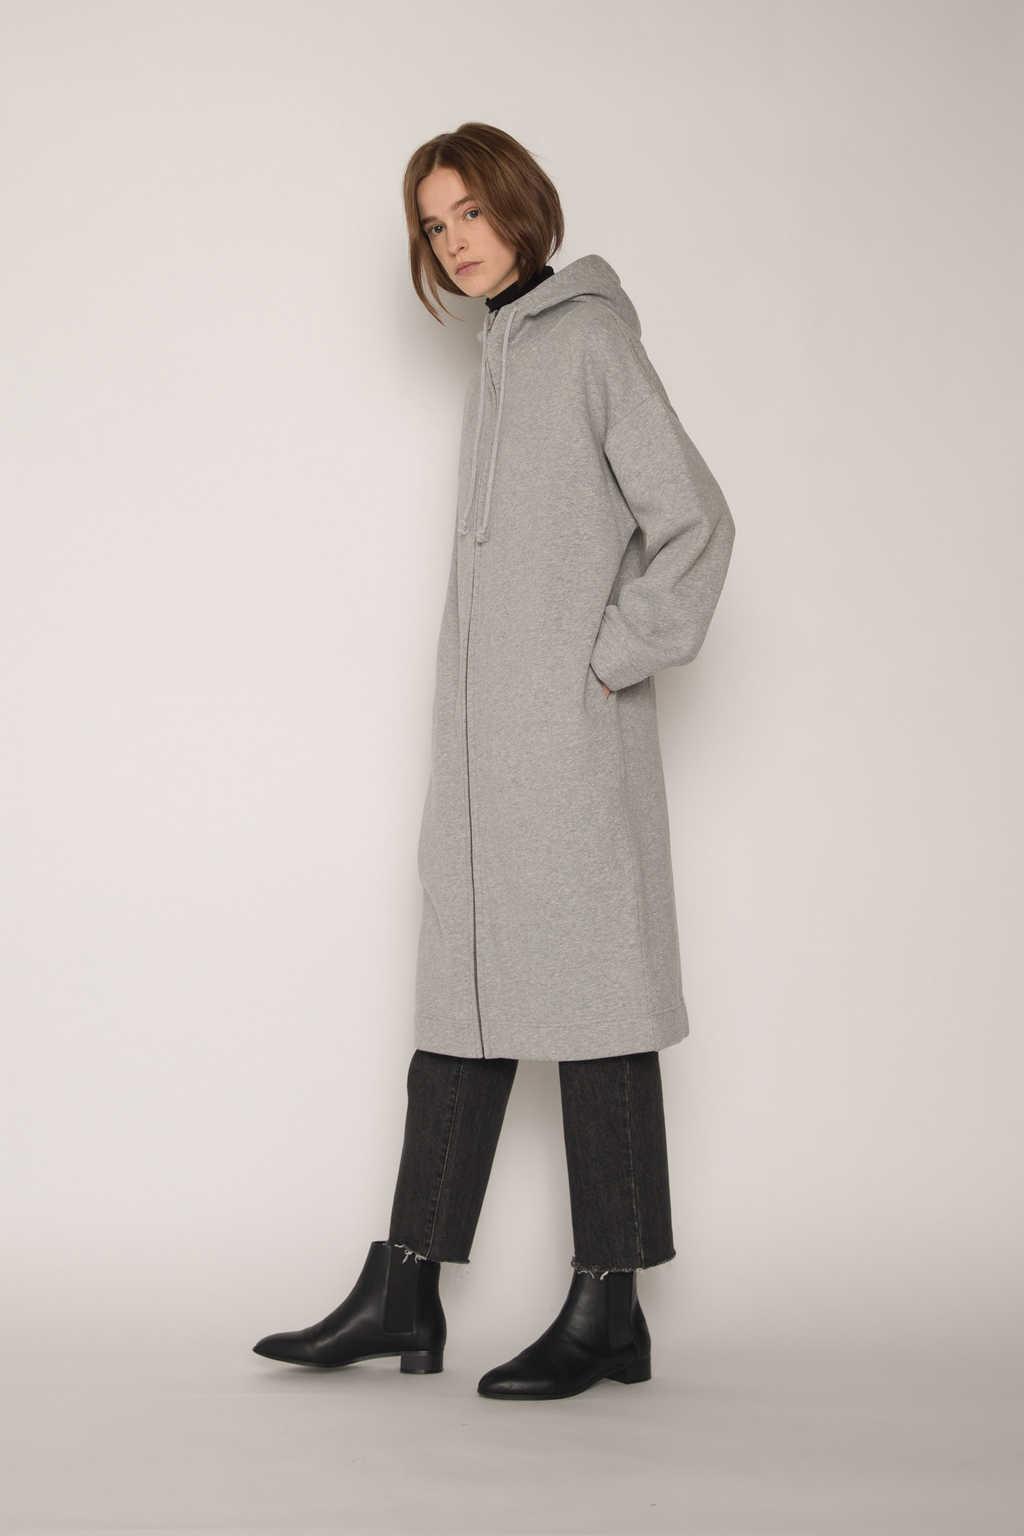 Hoodie Dress 1659 Gray 2